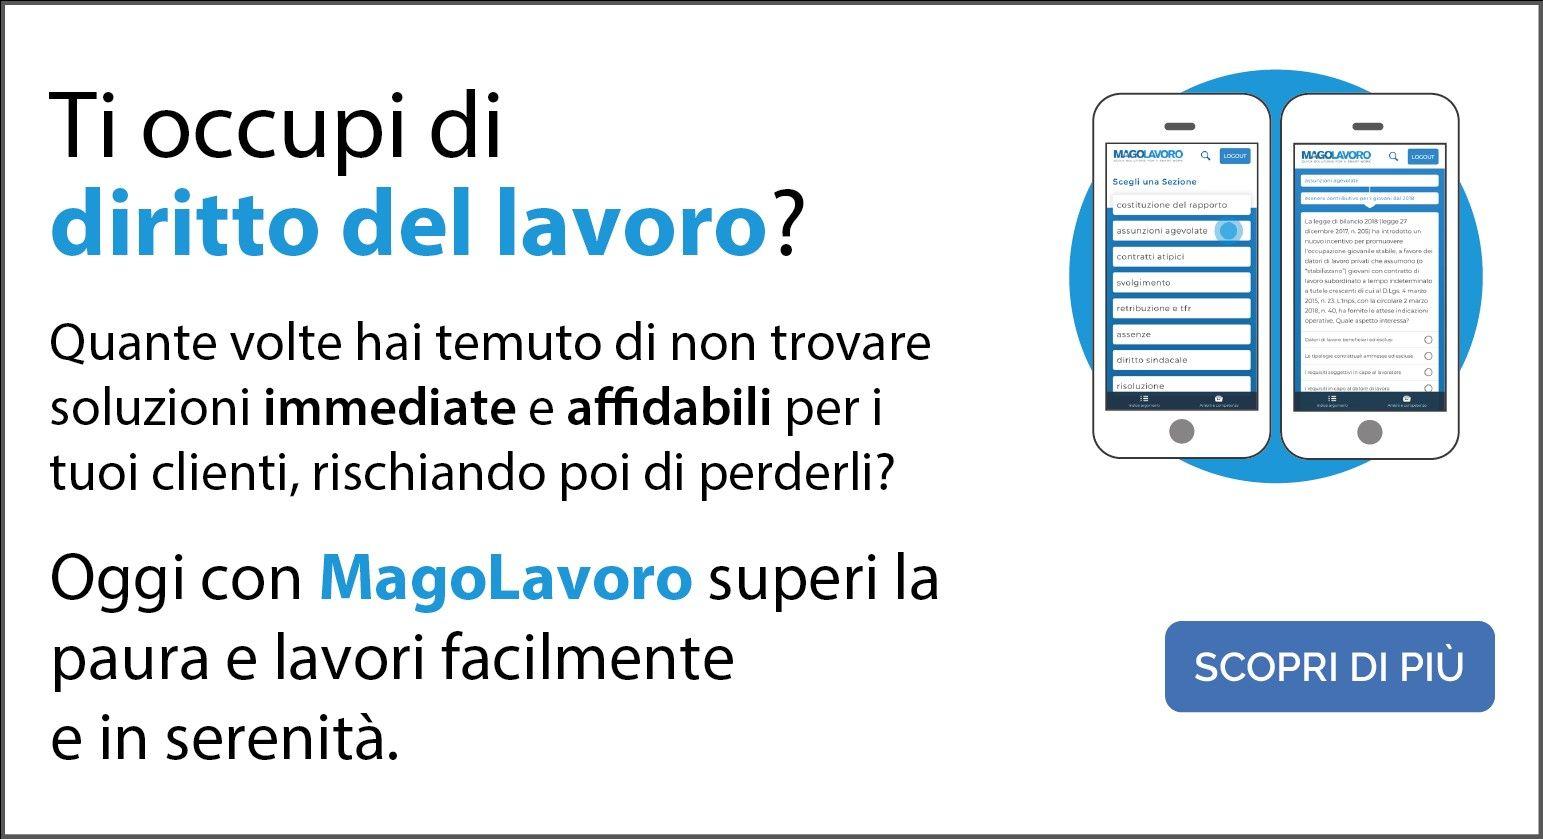 MagoLavoro